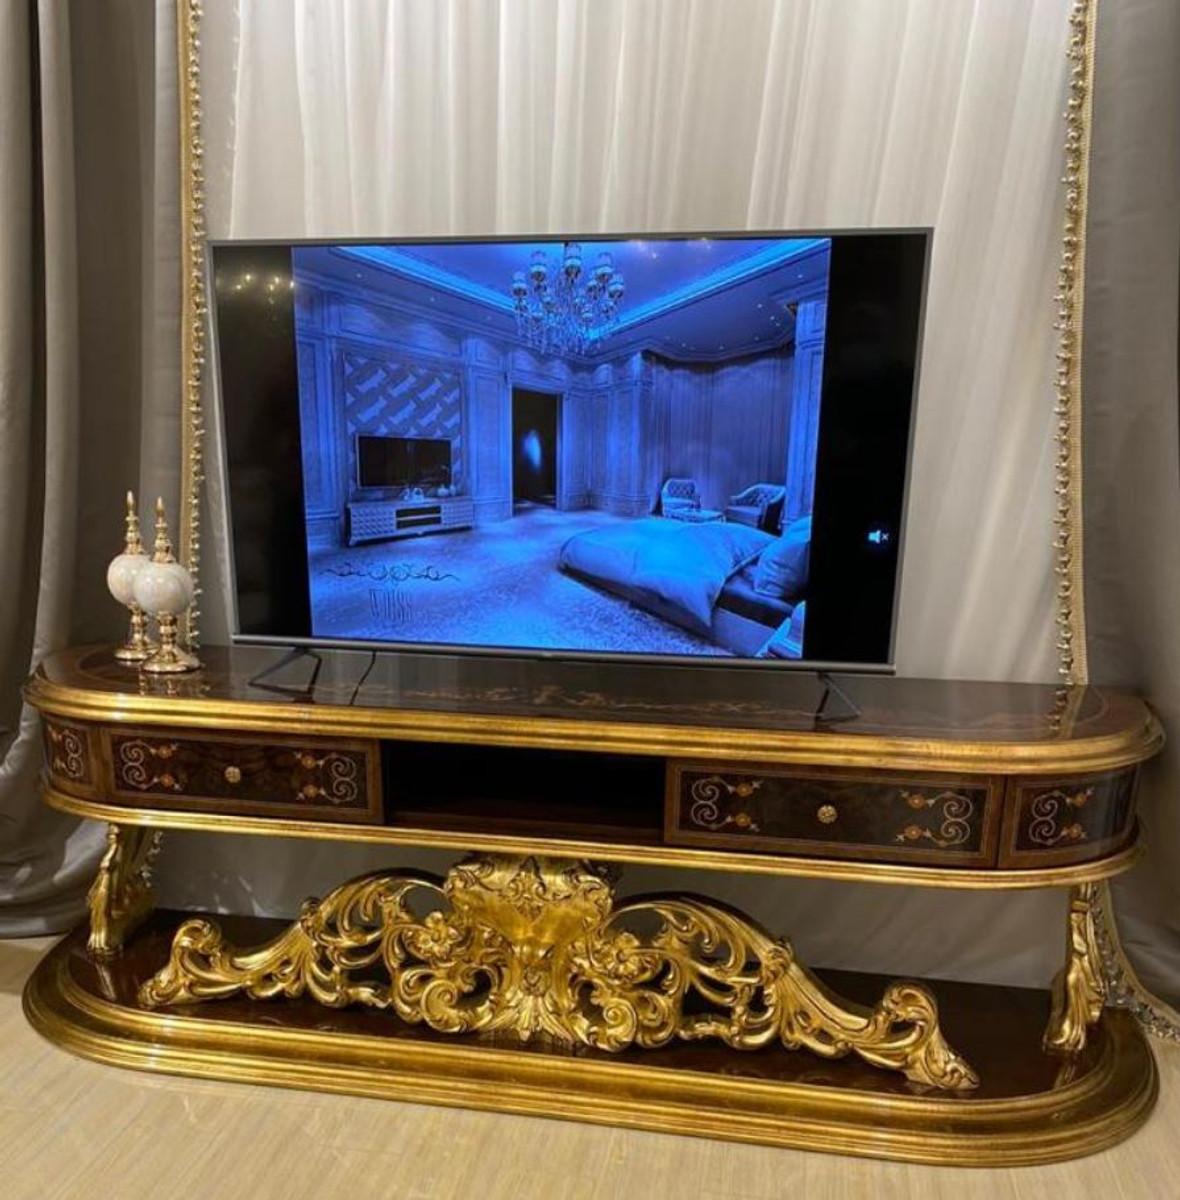 casa padrino armoire tv baroque de luxe marron or antique 220 x 50 x h 70 cm magnifique meuble tv en bois massif mobilier de salon baroque